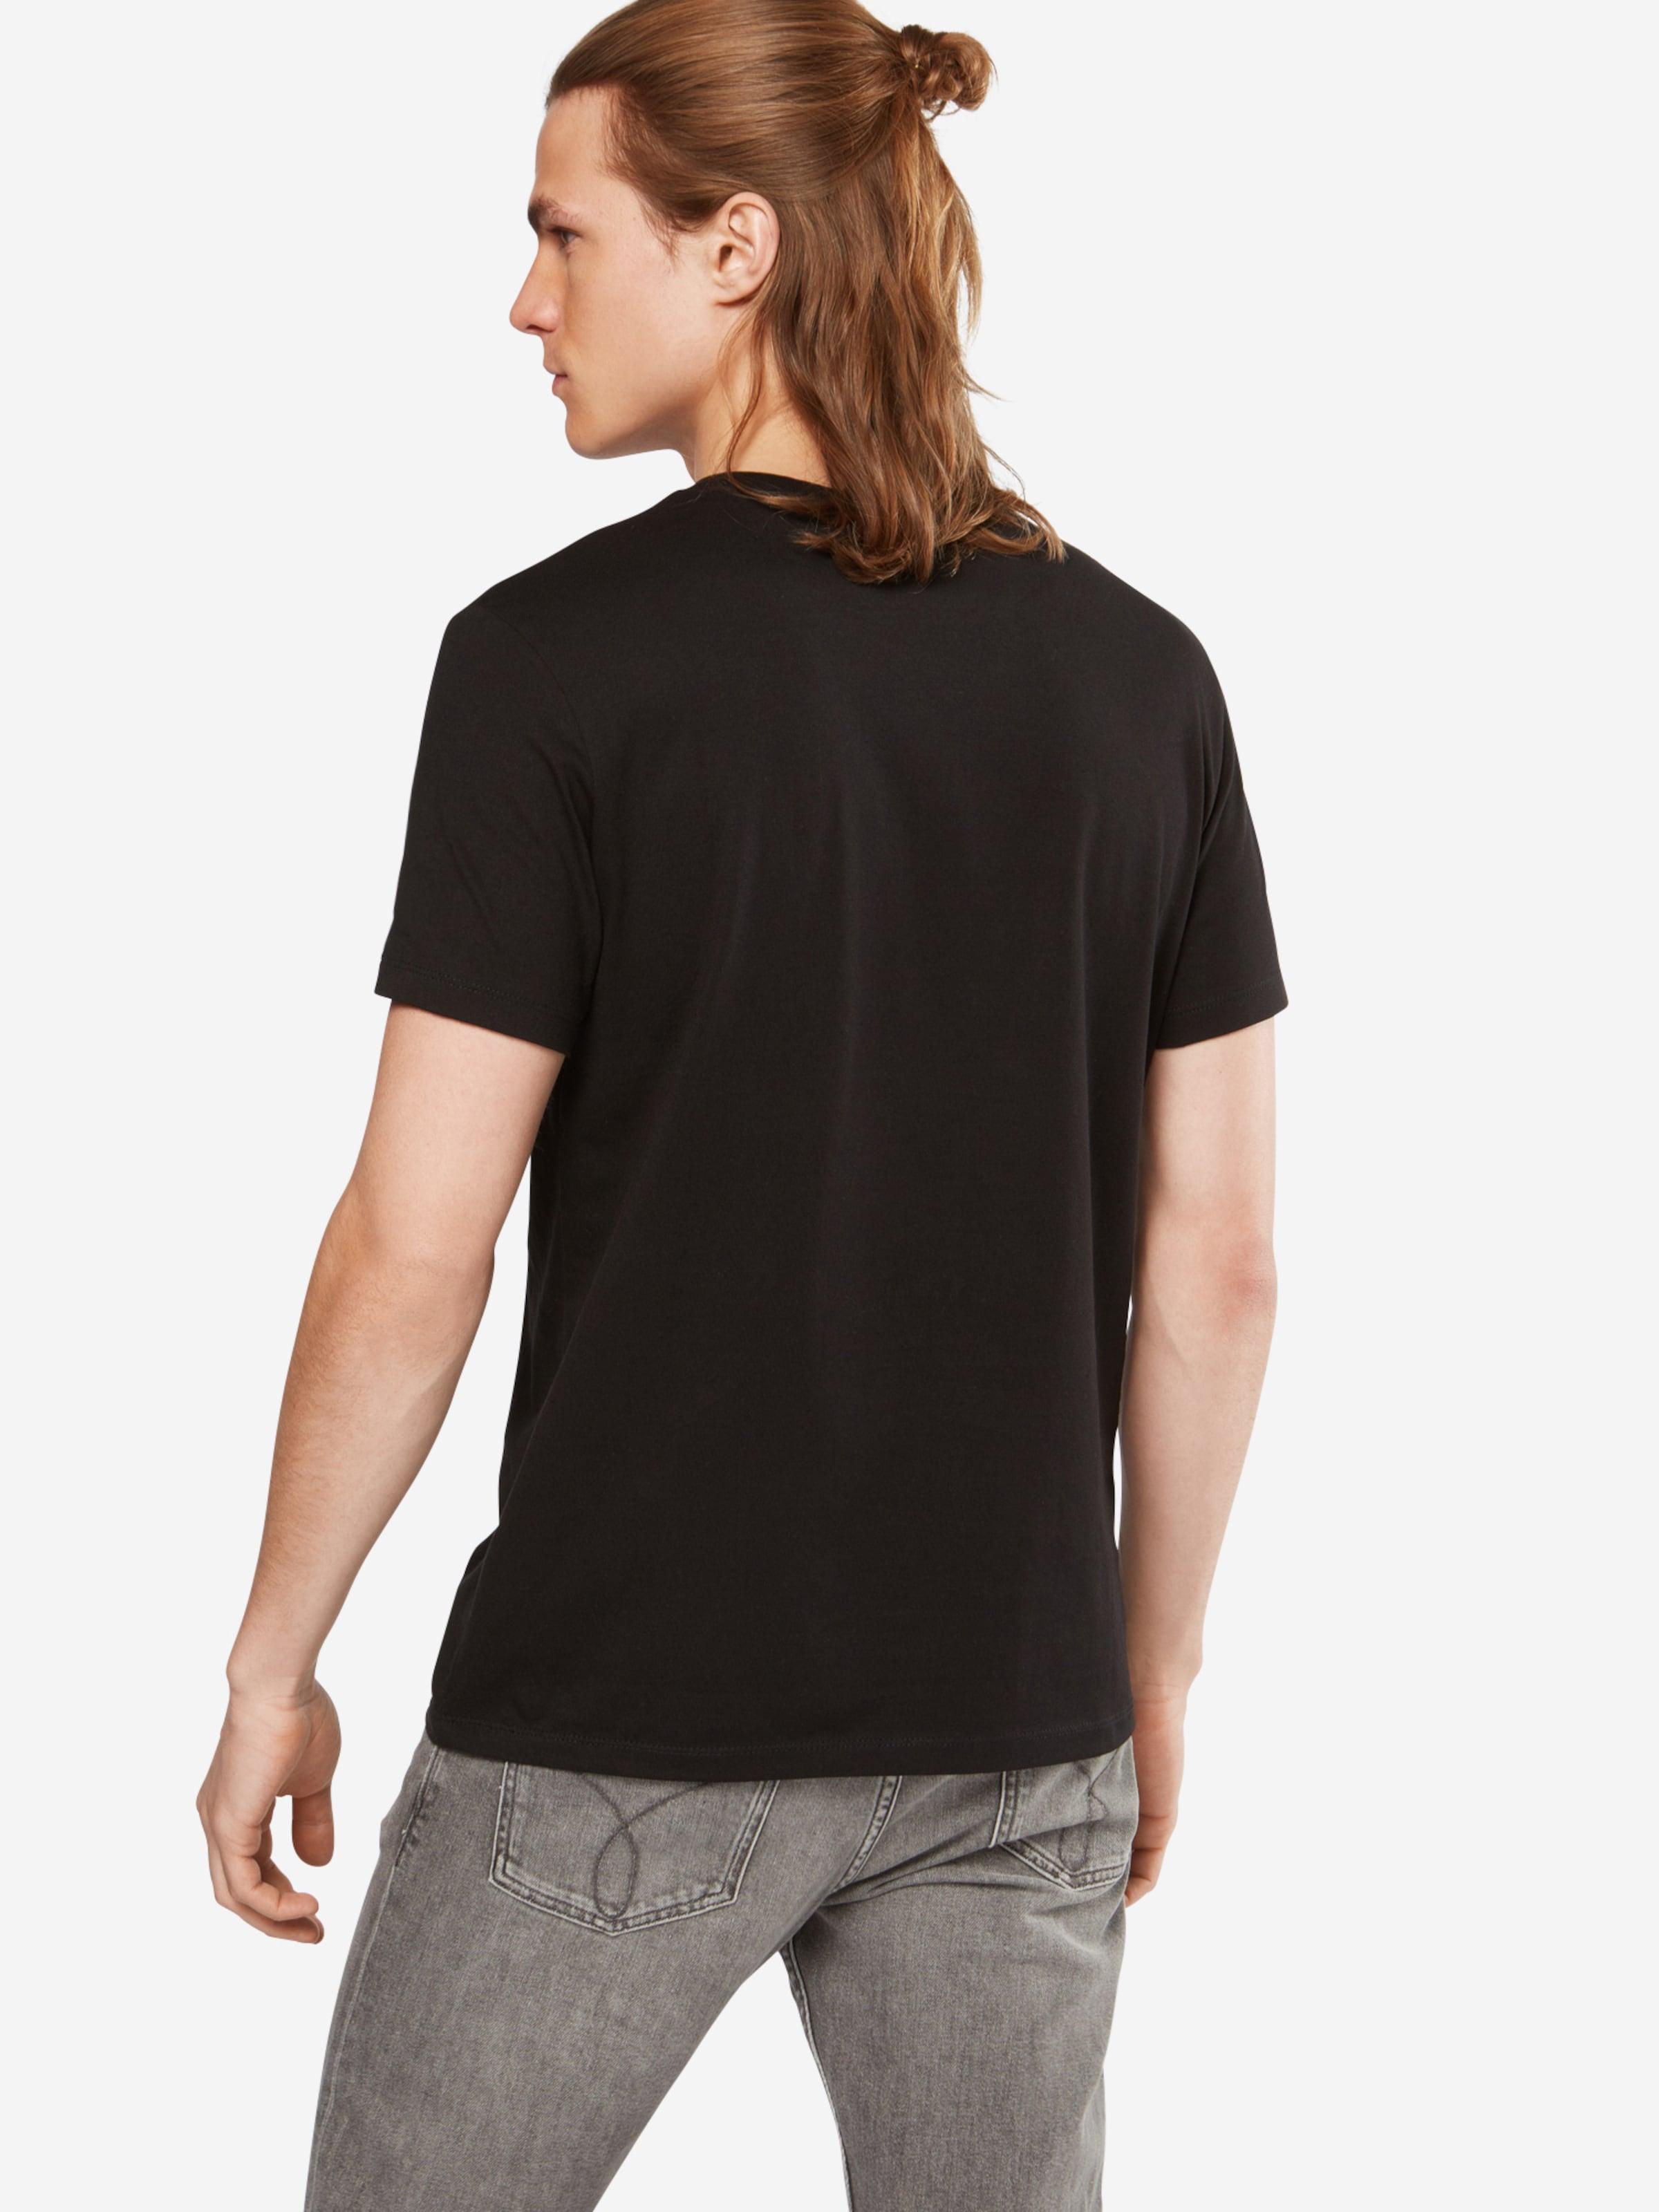 Marc O'Polo T-shirt 'short-sleeve v-neck shaped fit' Shop Online-Verkauf OtUDqOhx